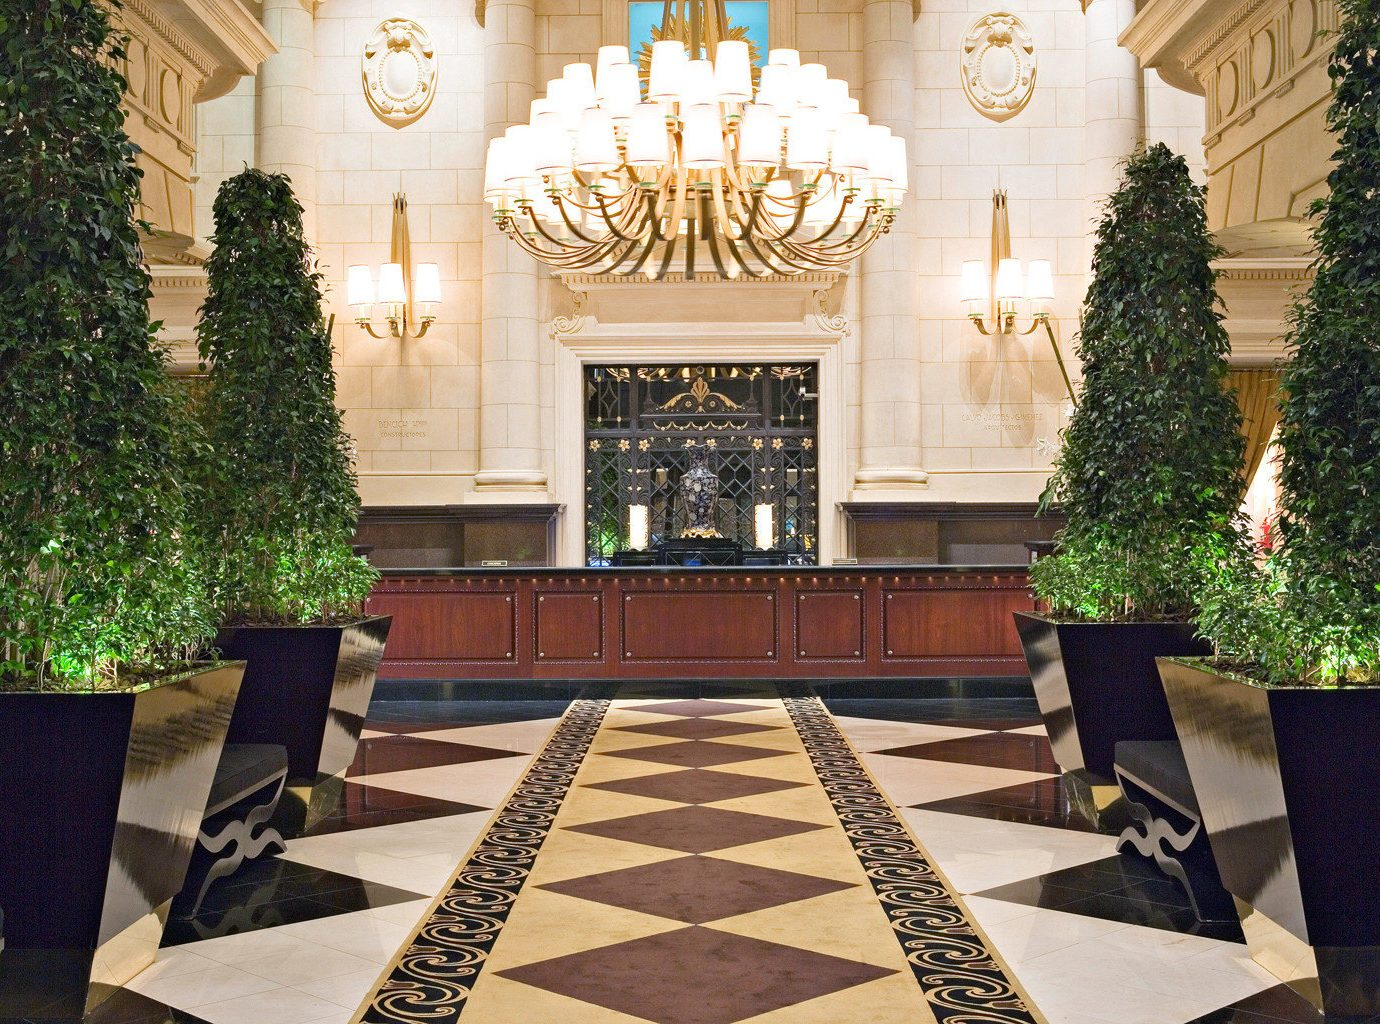 Elegant Lobby Modern tree palace mansion home Courtyard aisle ballroom plant flooring